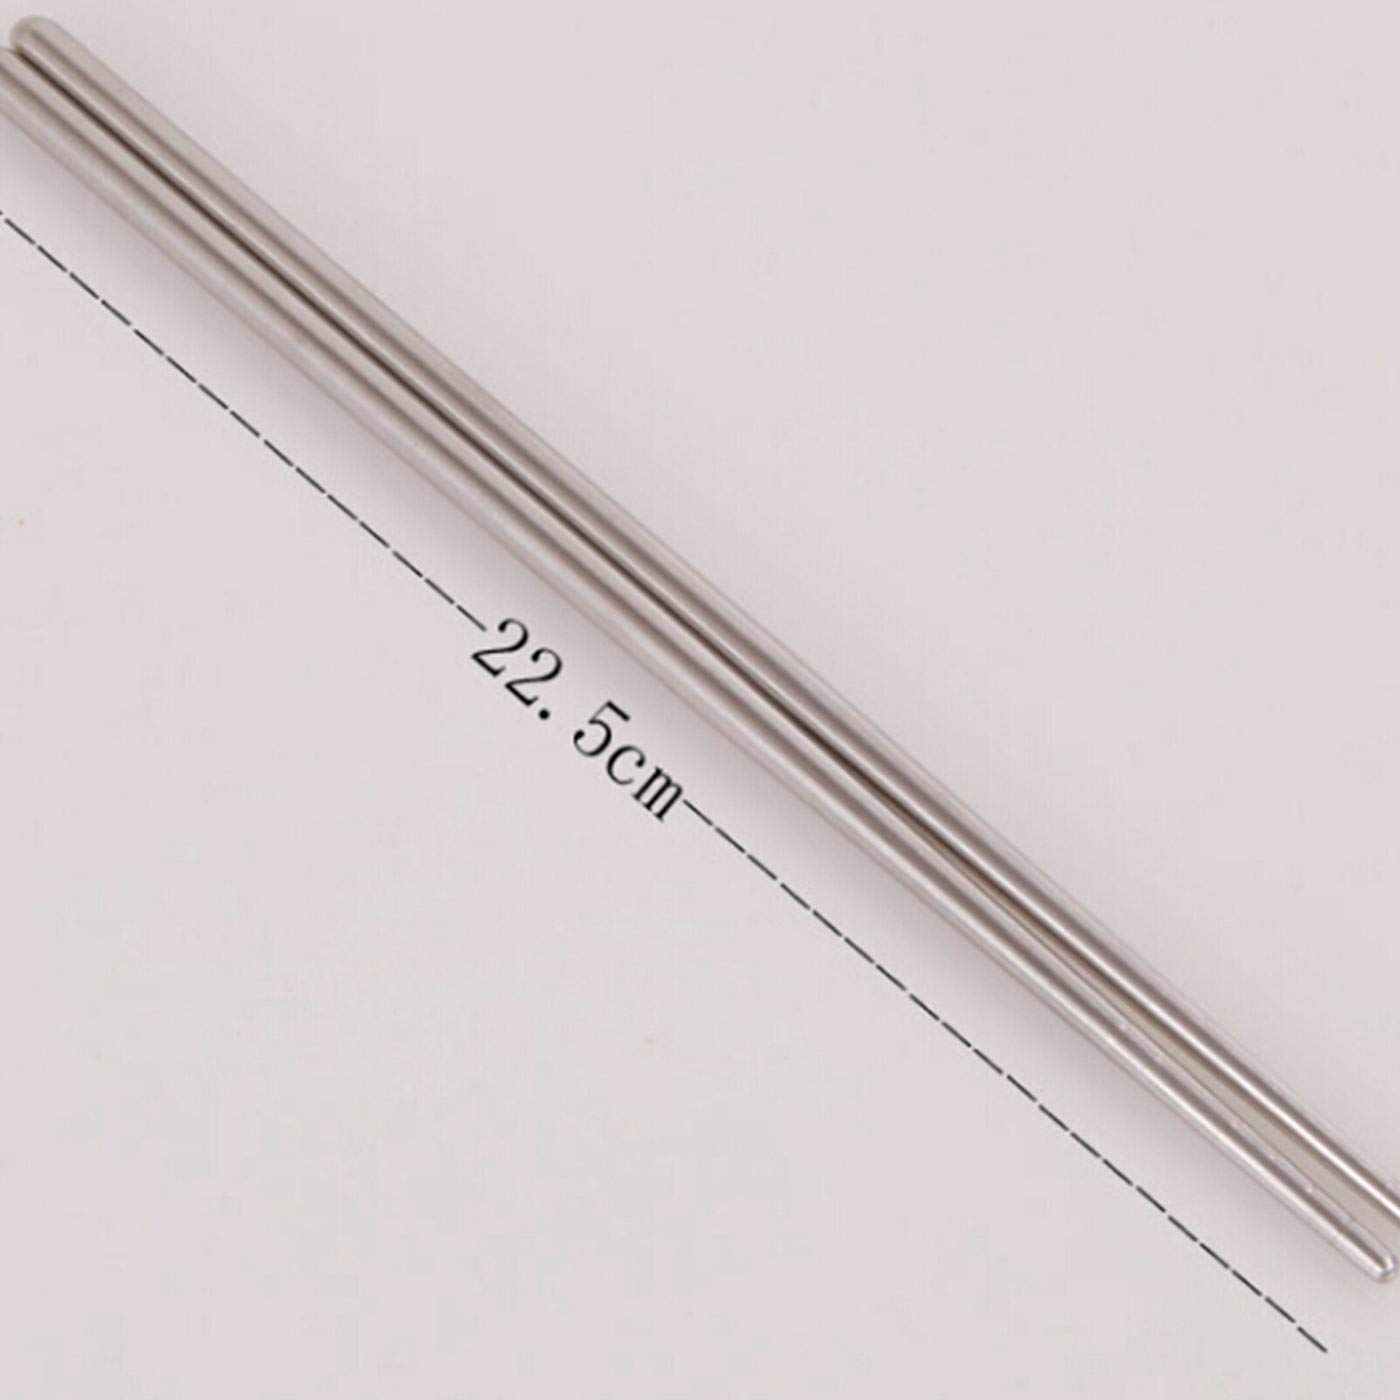 None 5 pairs of stainless steel chopsticks dfgjdryt Upgraded 5 Pair Stainless Steel Chopsticks Chinese Japanese Restaurant Chopsticks Set